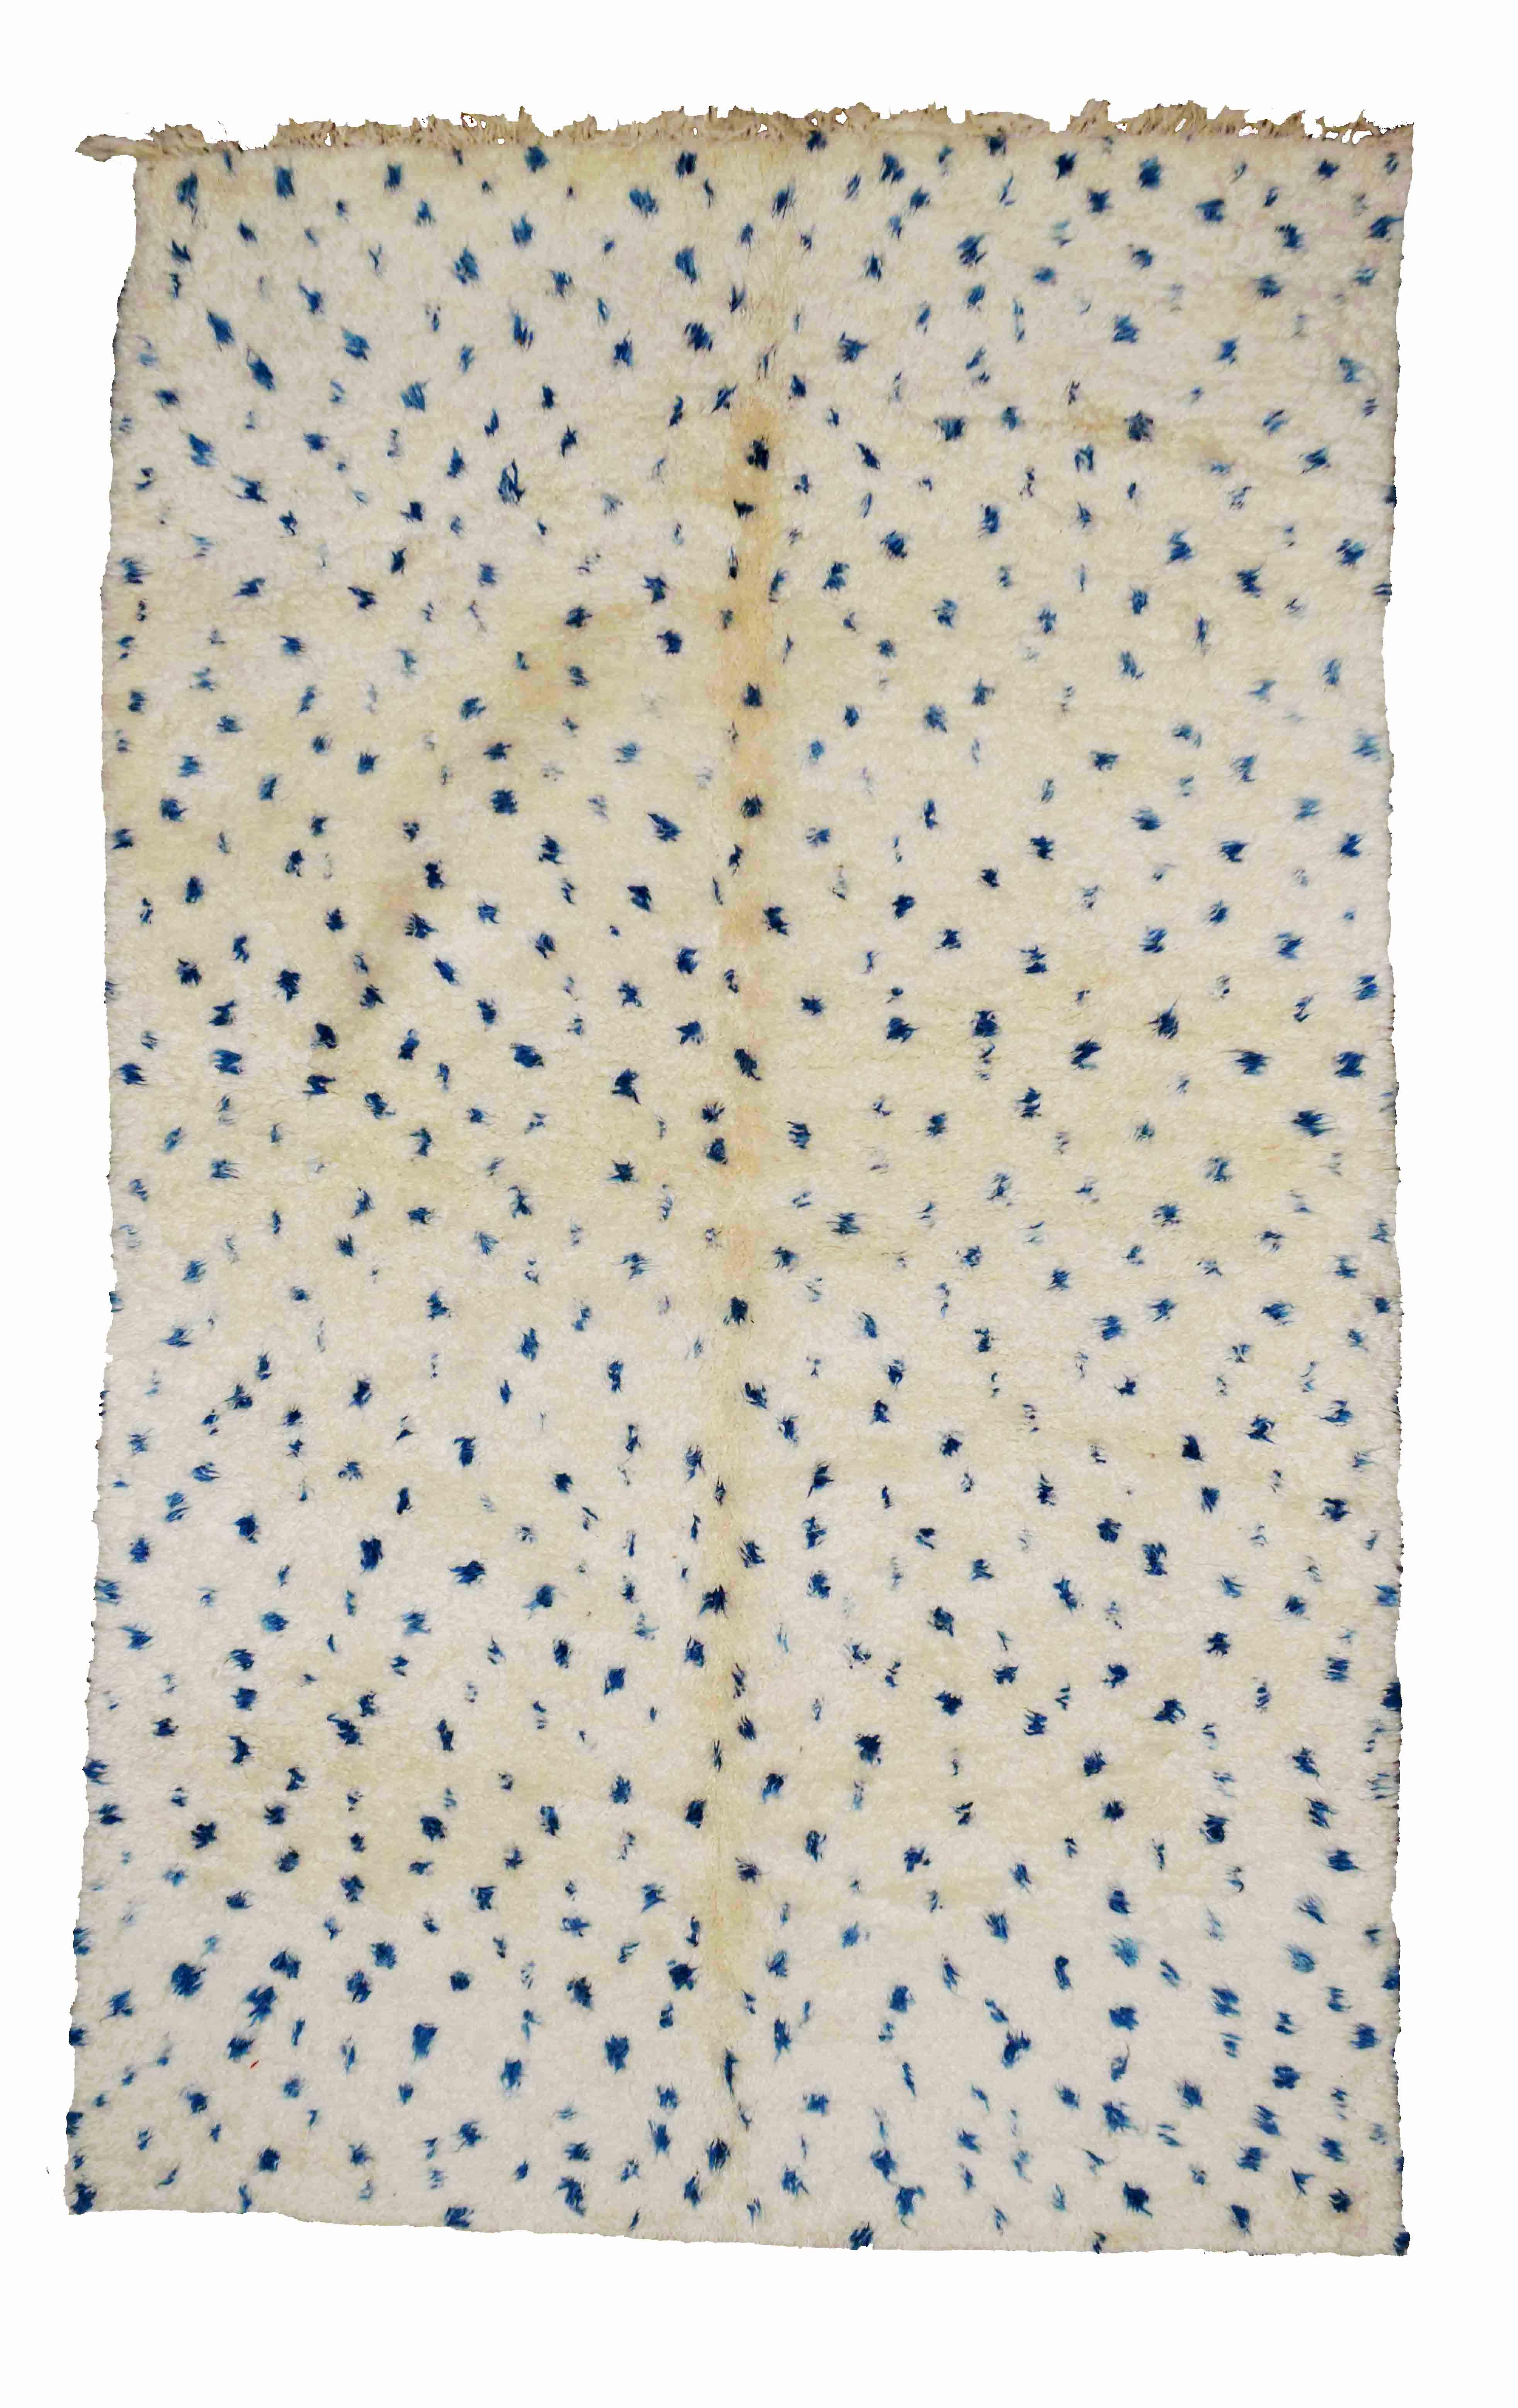 Beni Ourain BN050- 295 x 205 cm